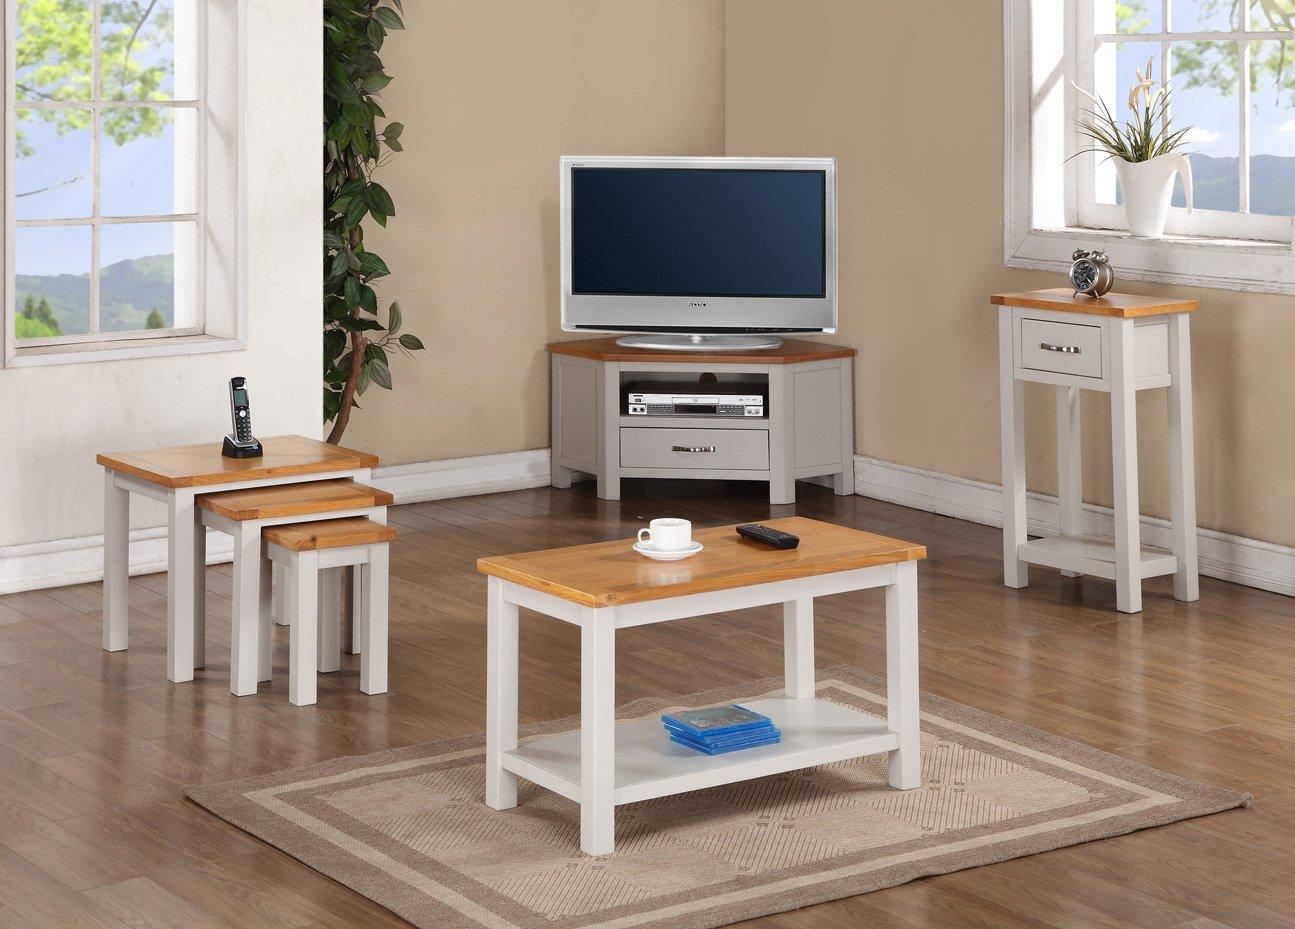 Roseland Furniture Mullion Painted Corner TV Stand with Drawer, Wood, Stone Grey RF09731